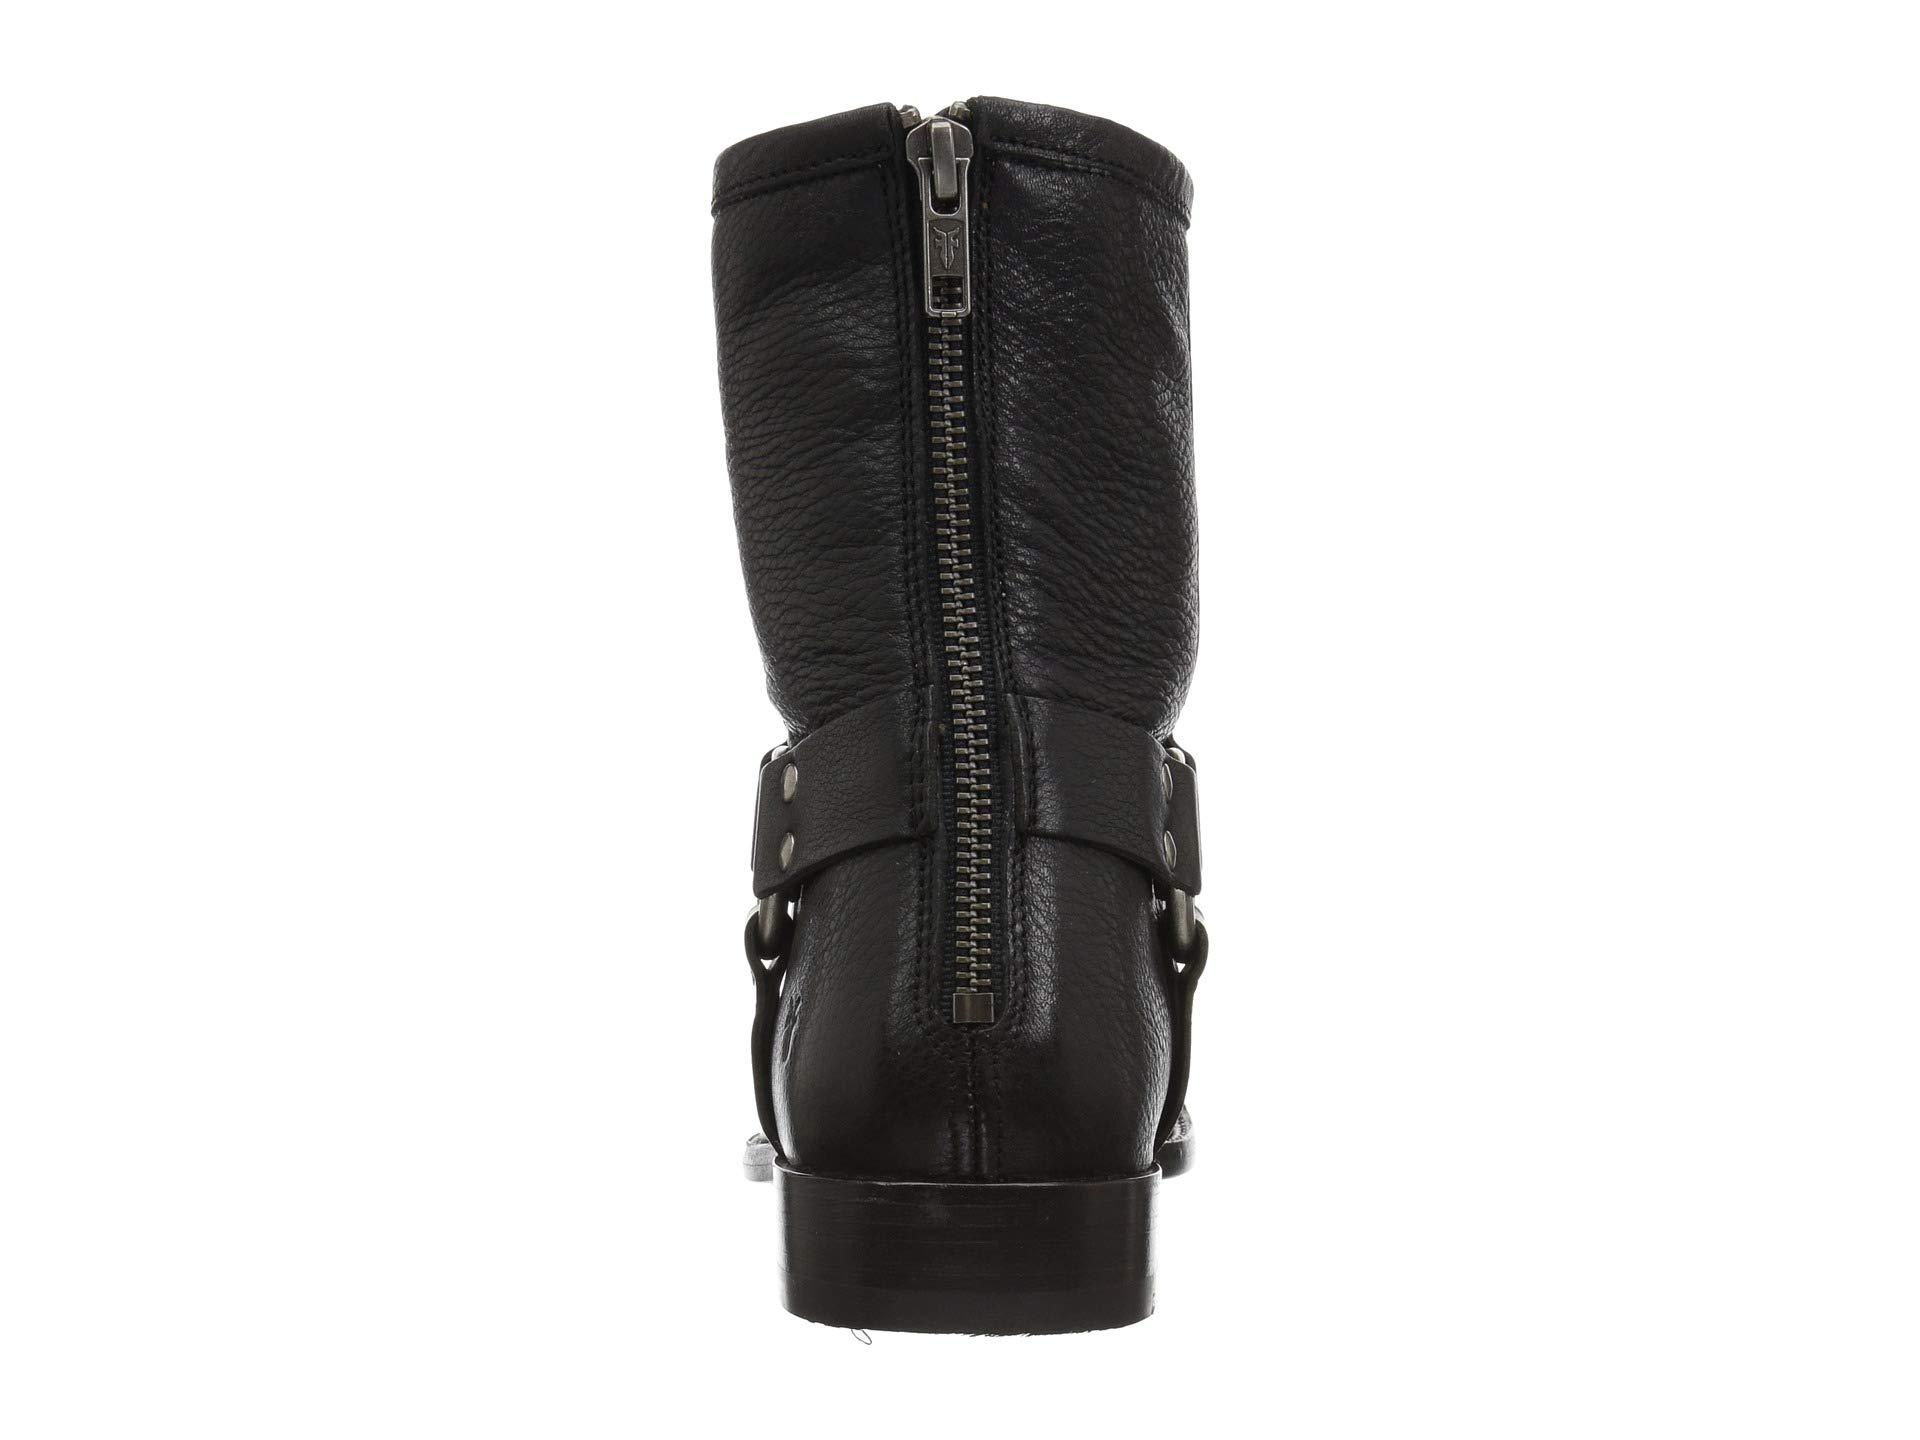 Phillip Frye Leather Short Soft Black Vintage Harness z77qAwd